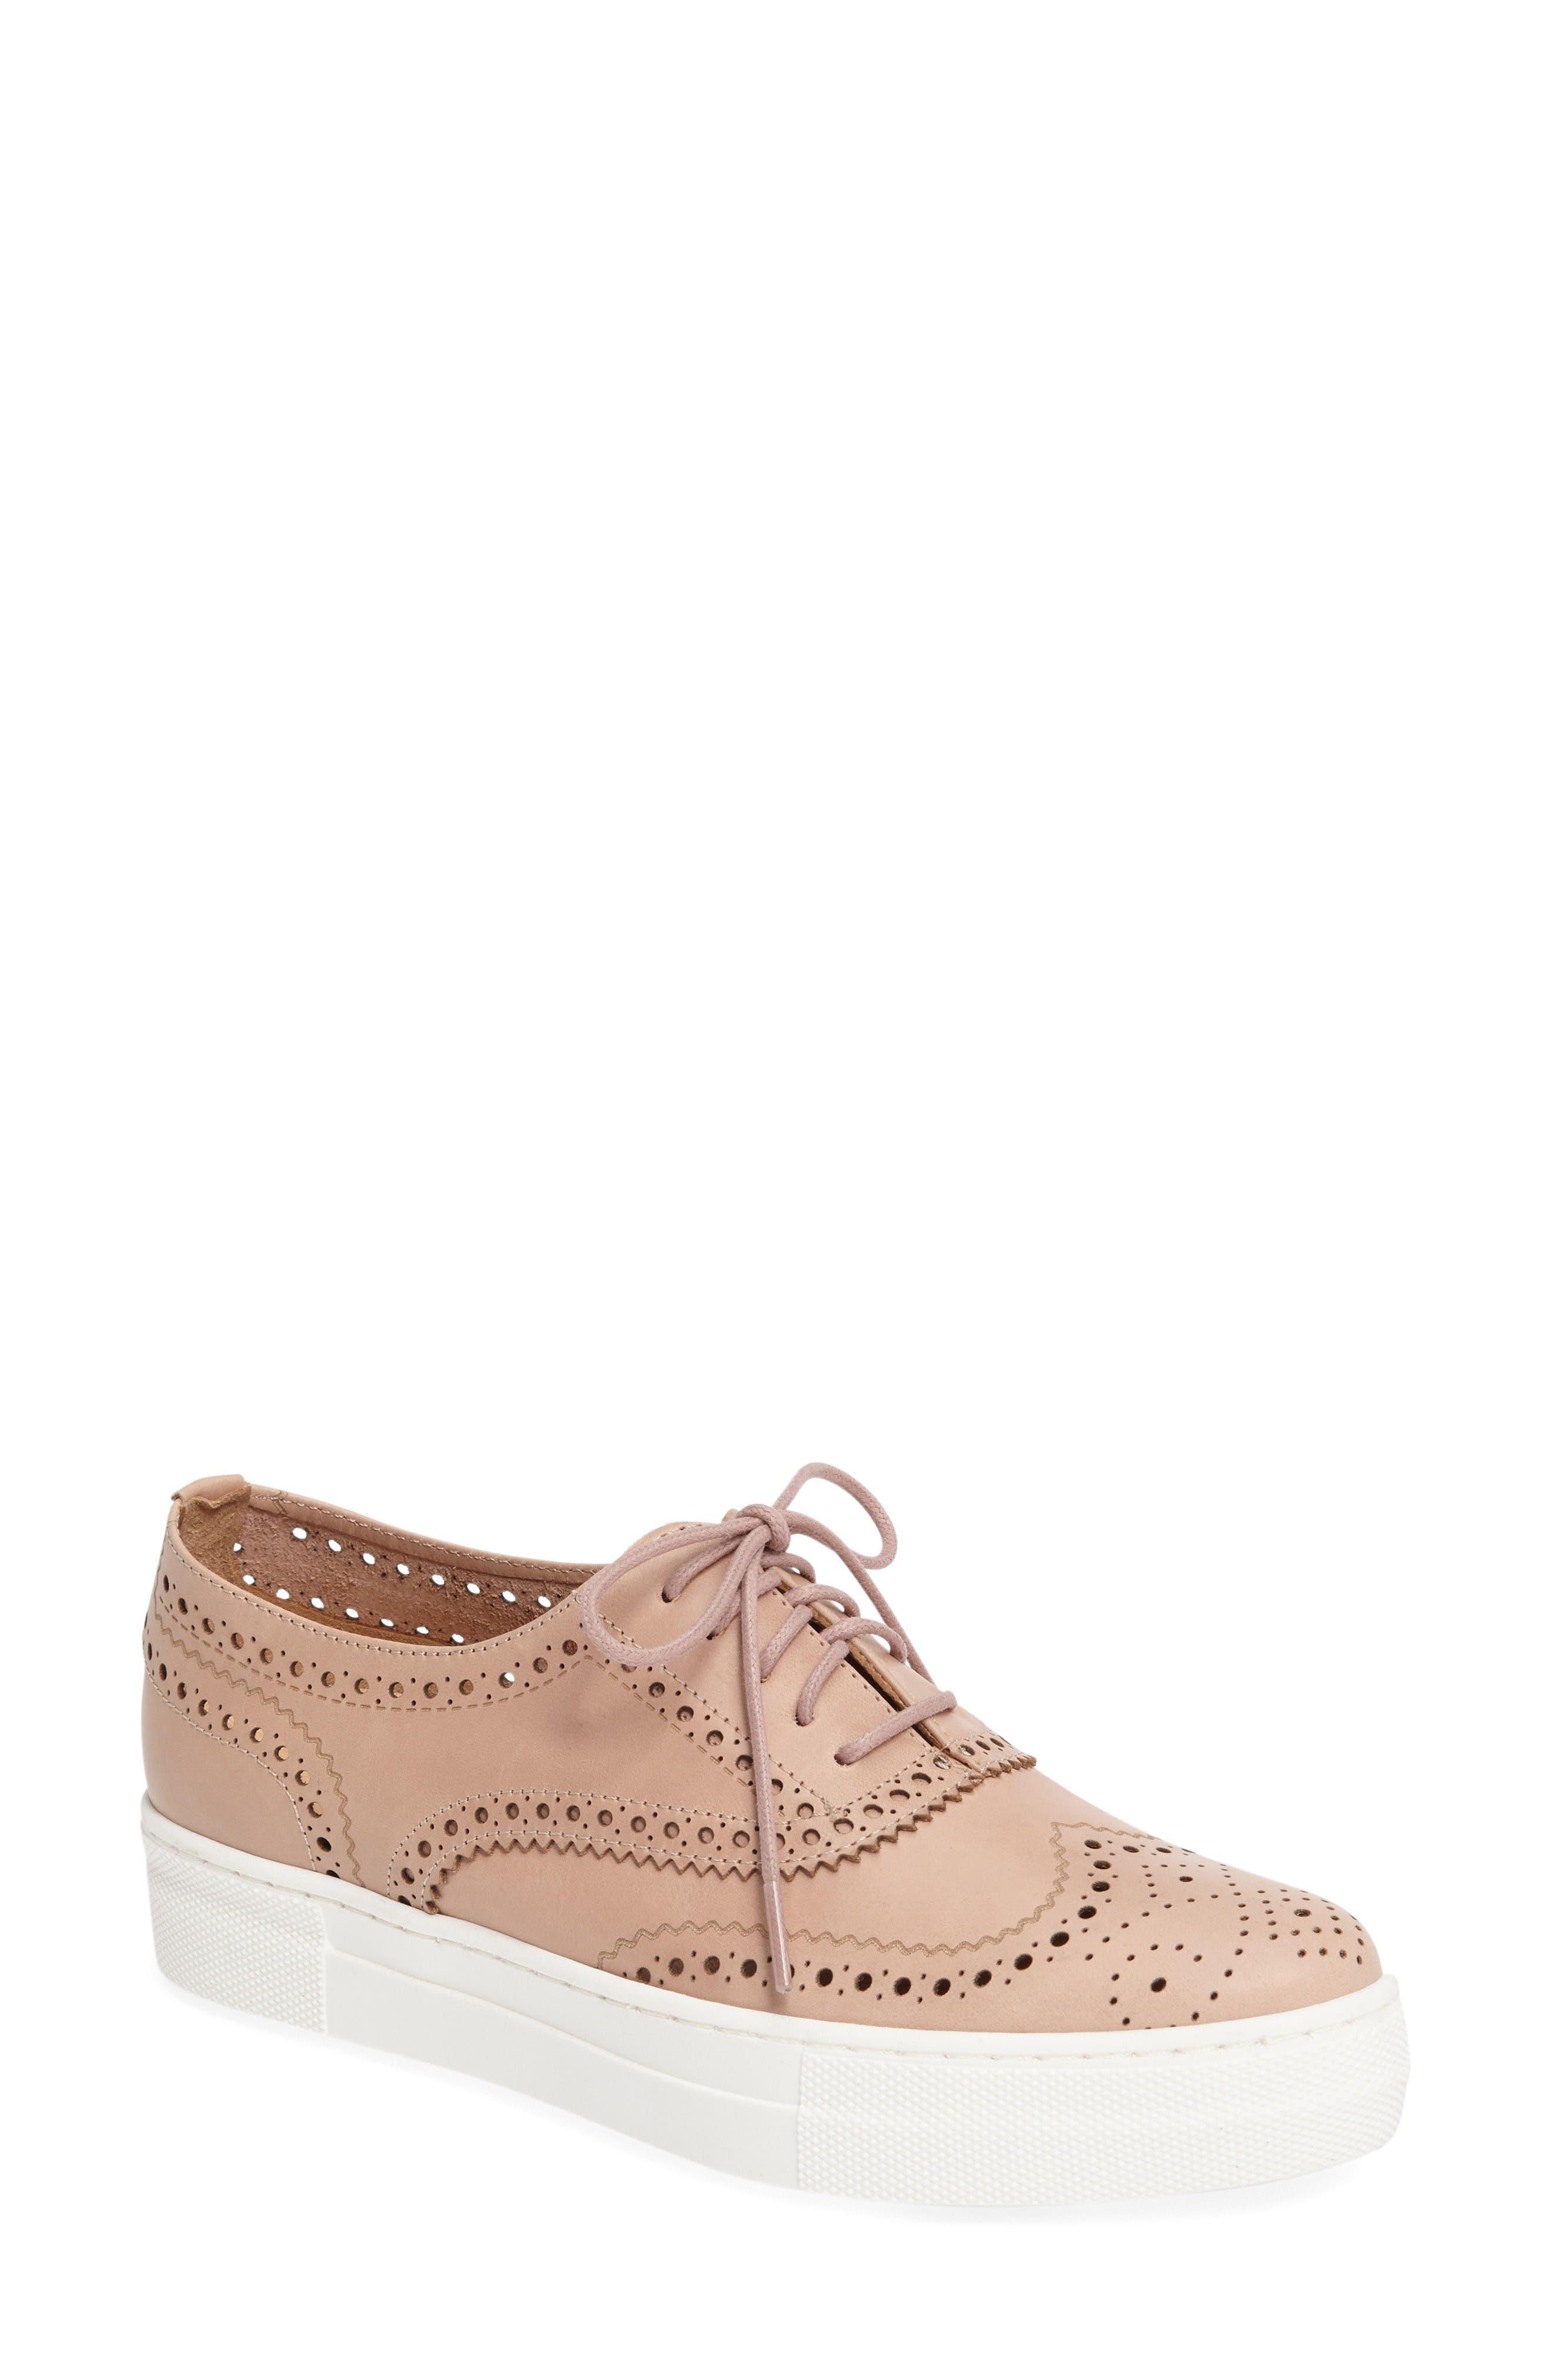 Main Image - Shellys London Kimmie Perforated Platform Sneaker (Women)